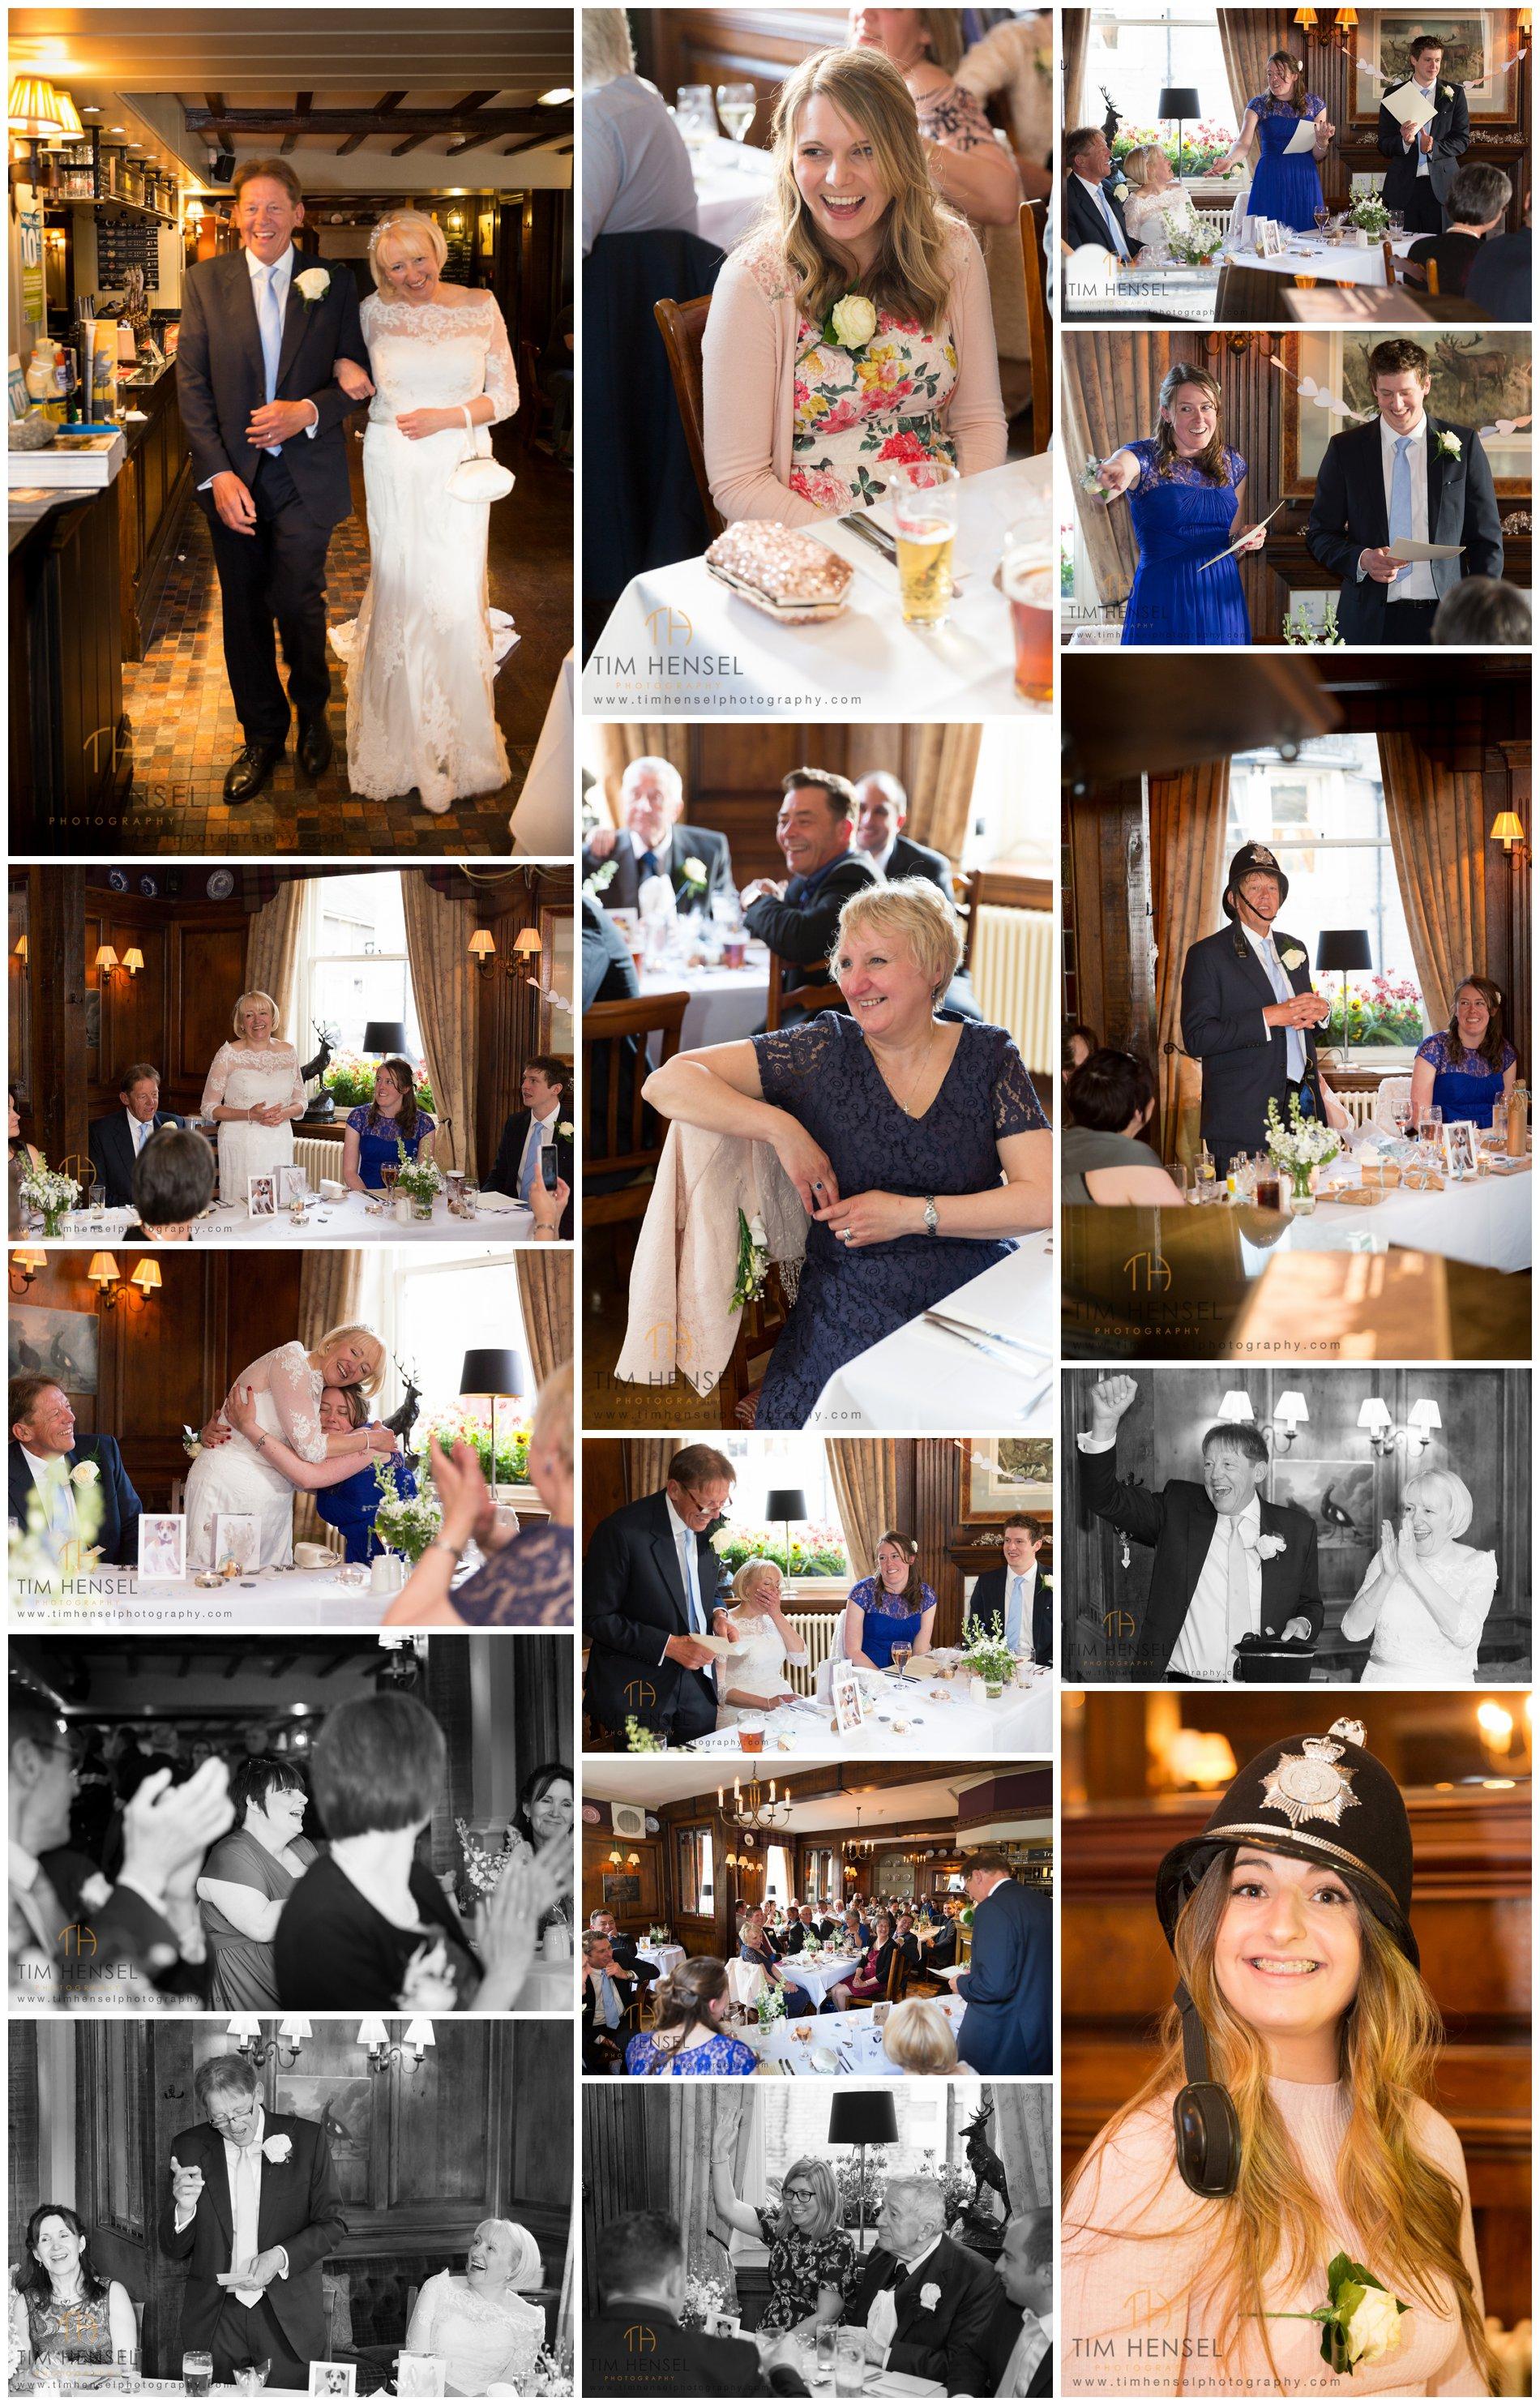 Wedding reception photos at The Bull's Head in Castleton, Derbyshire